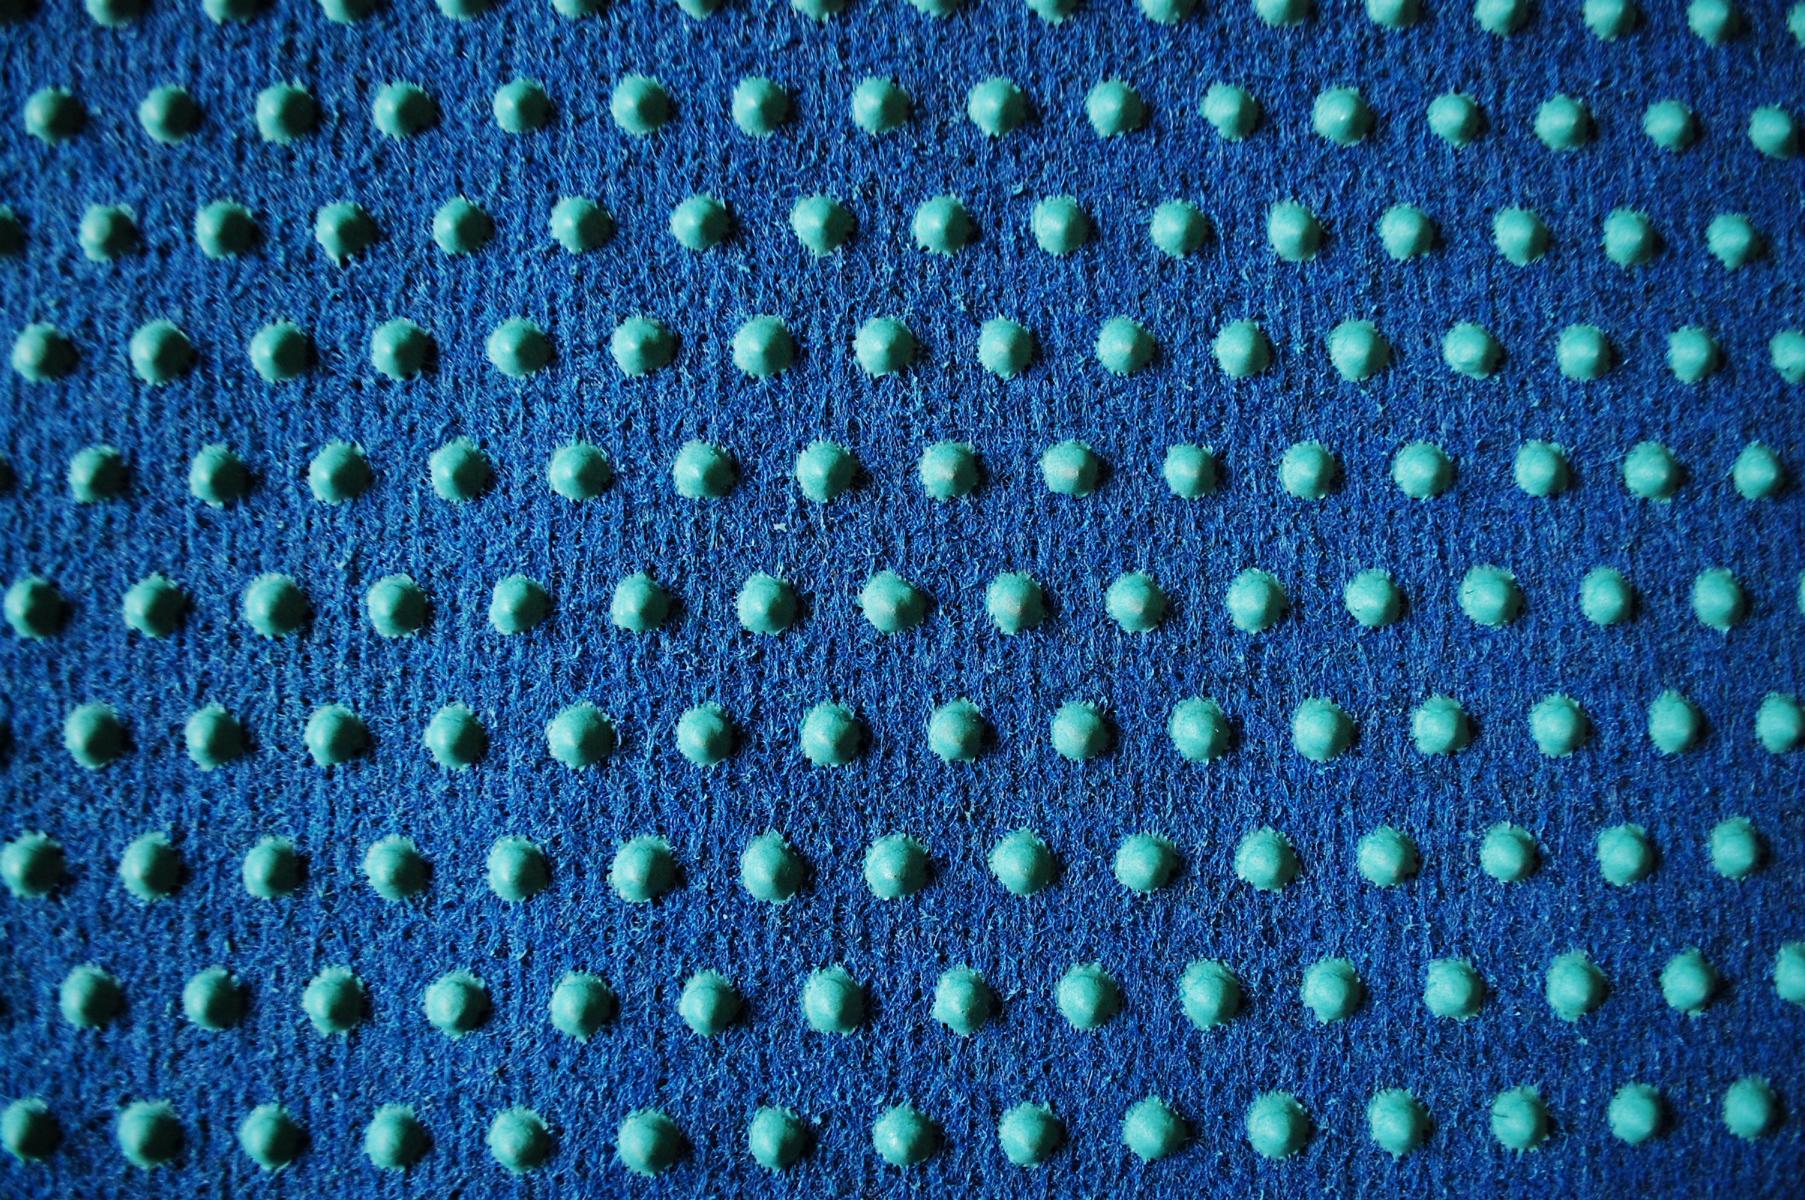 tapis de gazon gazon artificiel comfort bleu 200x310 cm ebay. Black Bedroom Furniture Sets. Home Design Ideas